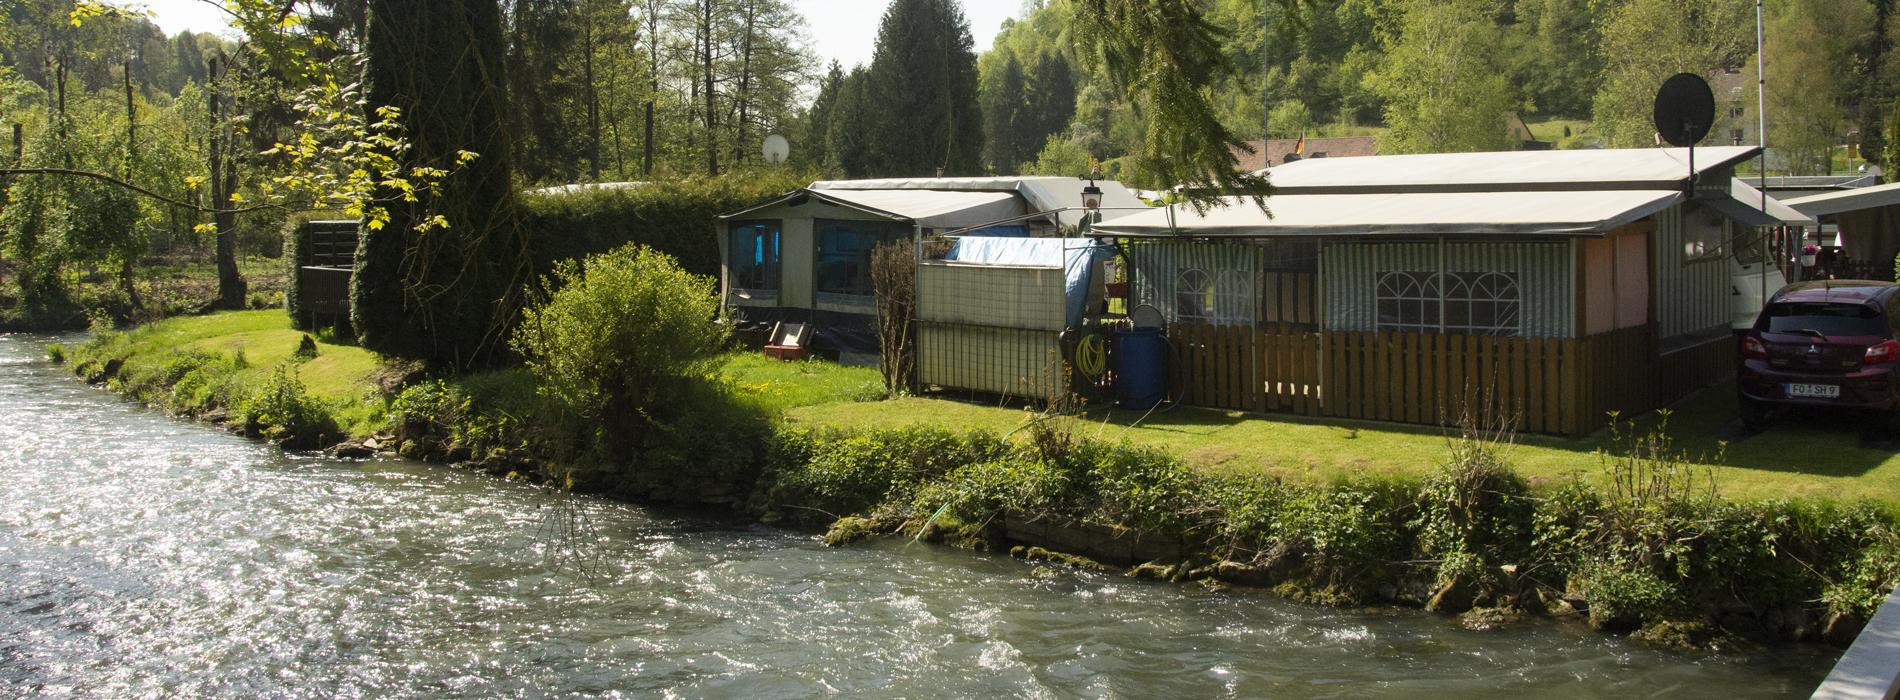 Campingplatz Waischenfeld -Direkt an der Wisent